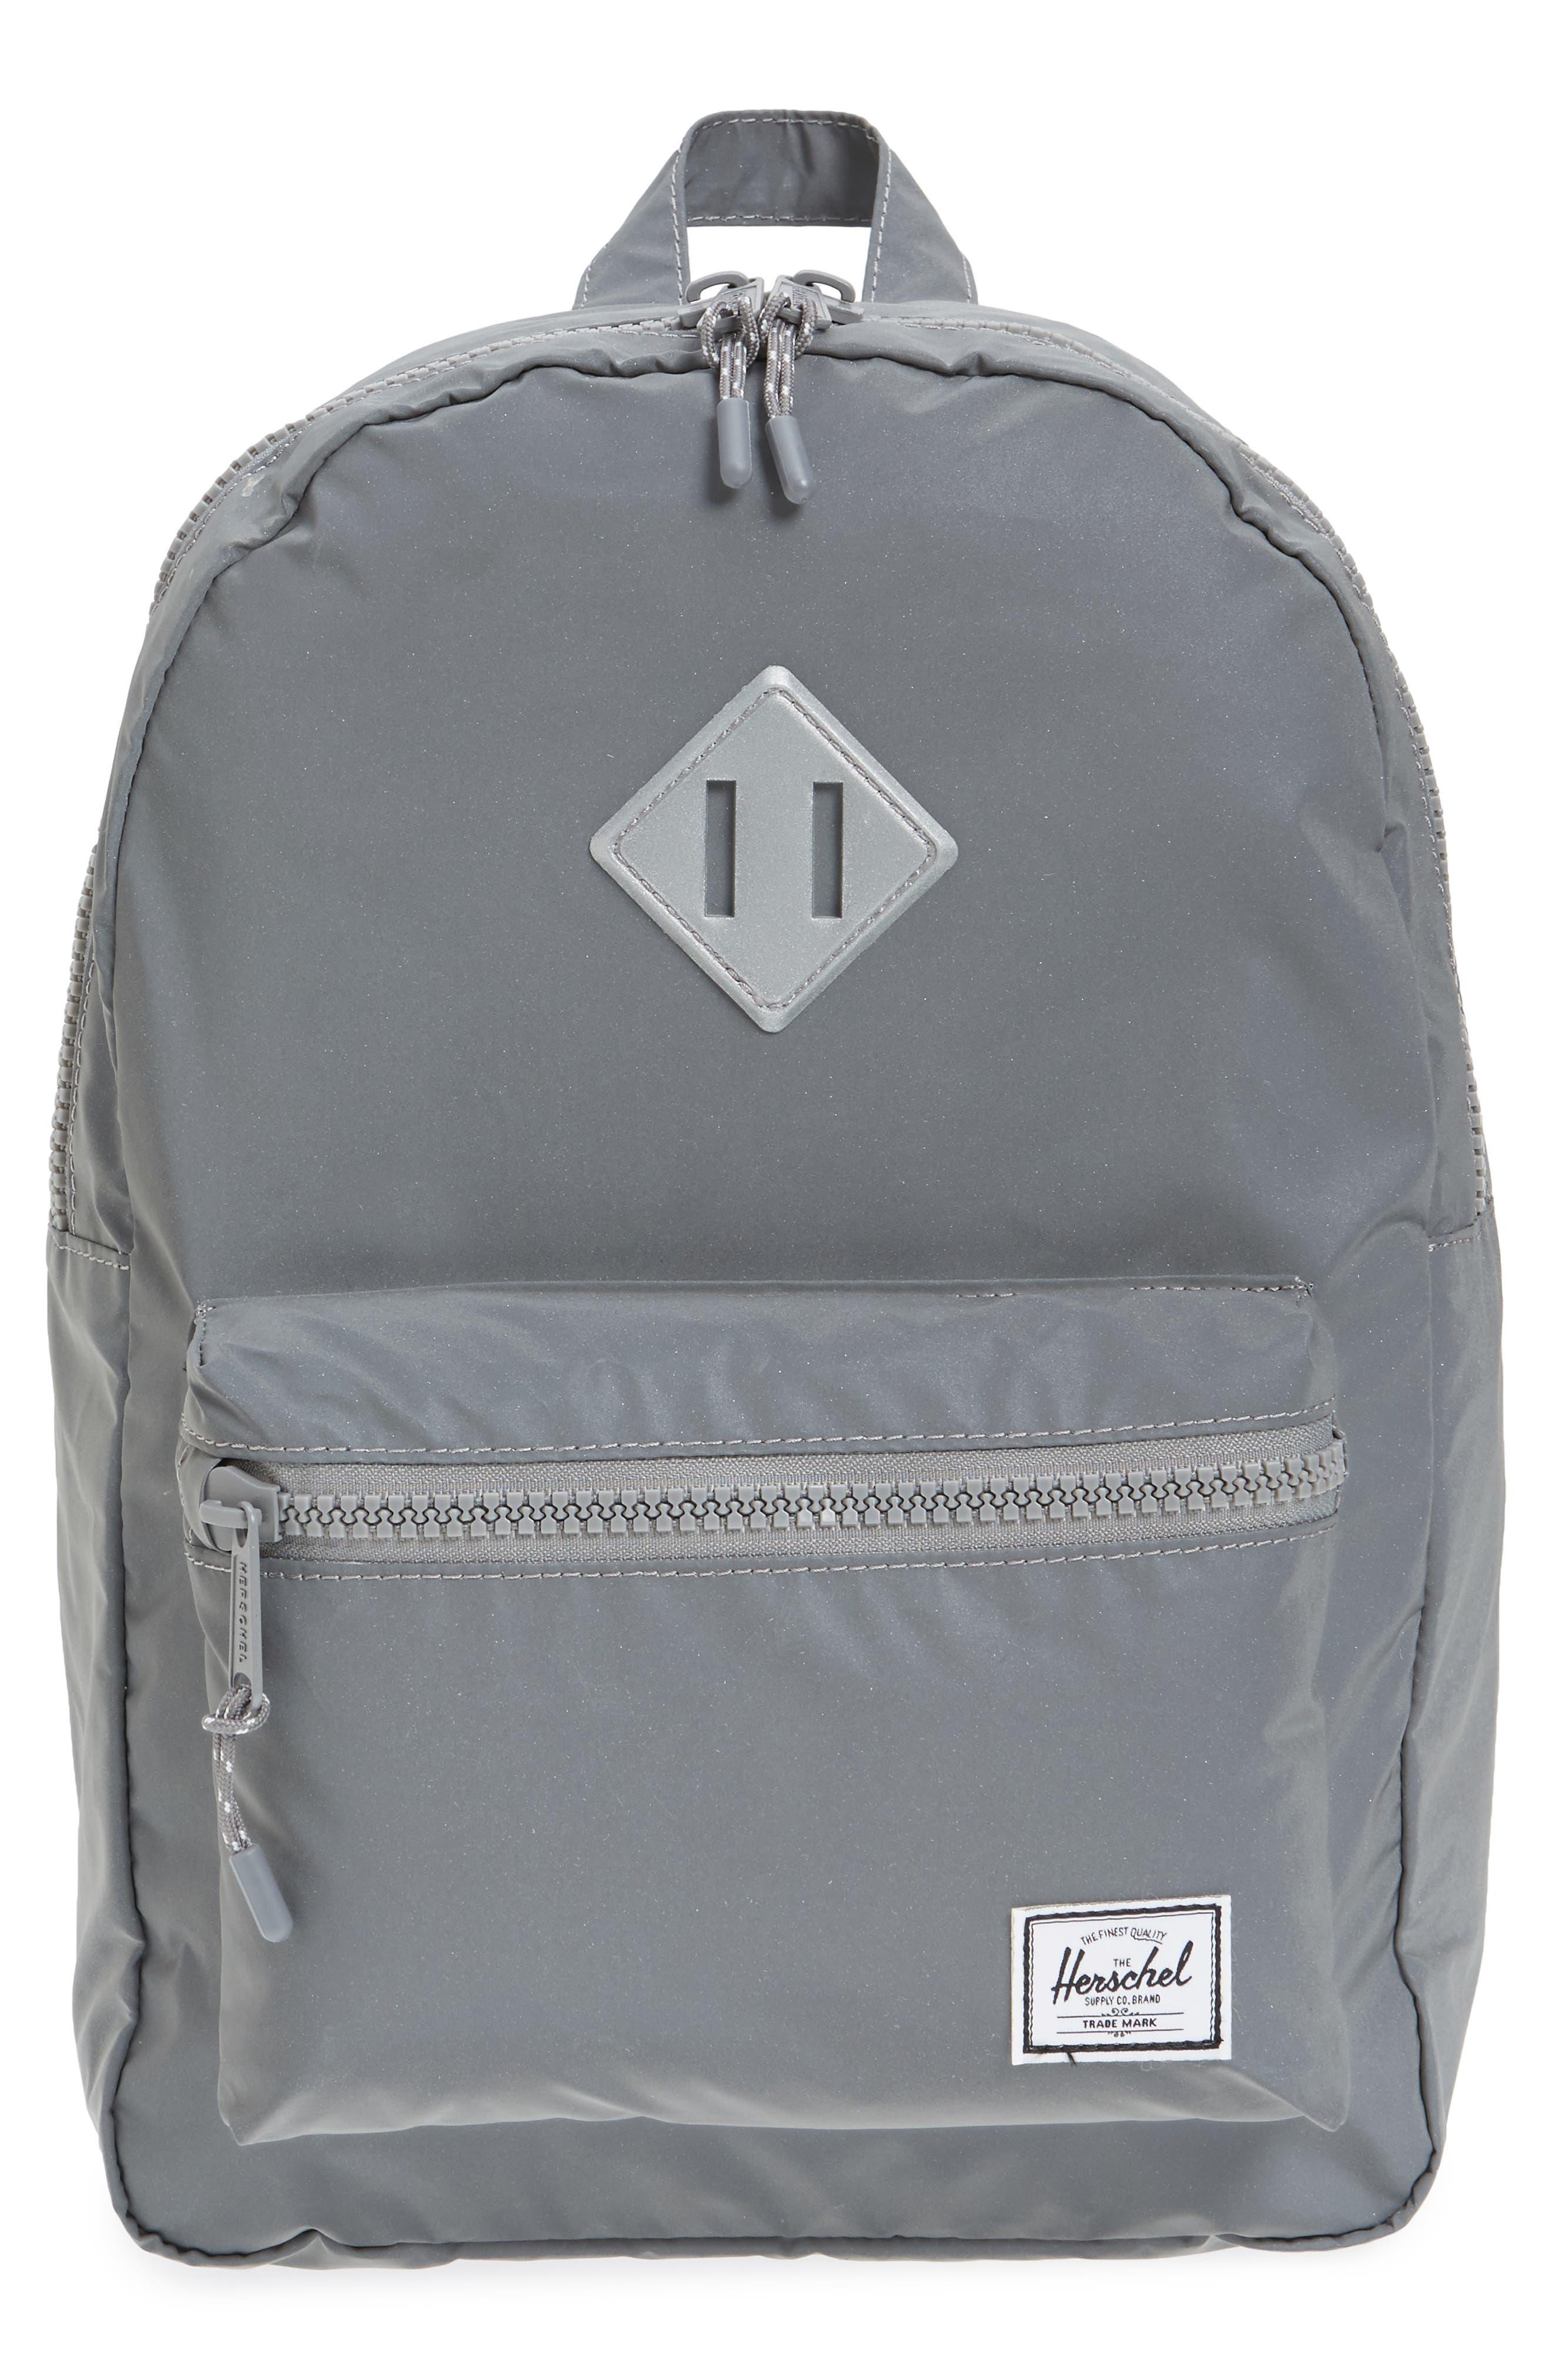 Alternate Image 1 Selected - Herschel Supply Co. Heritage Reflective Backpack (Kids)